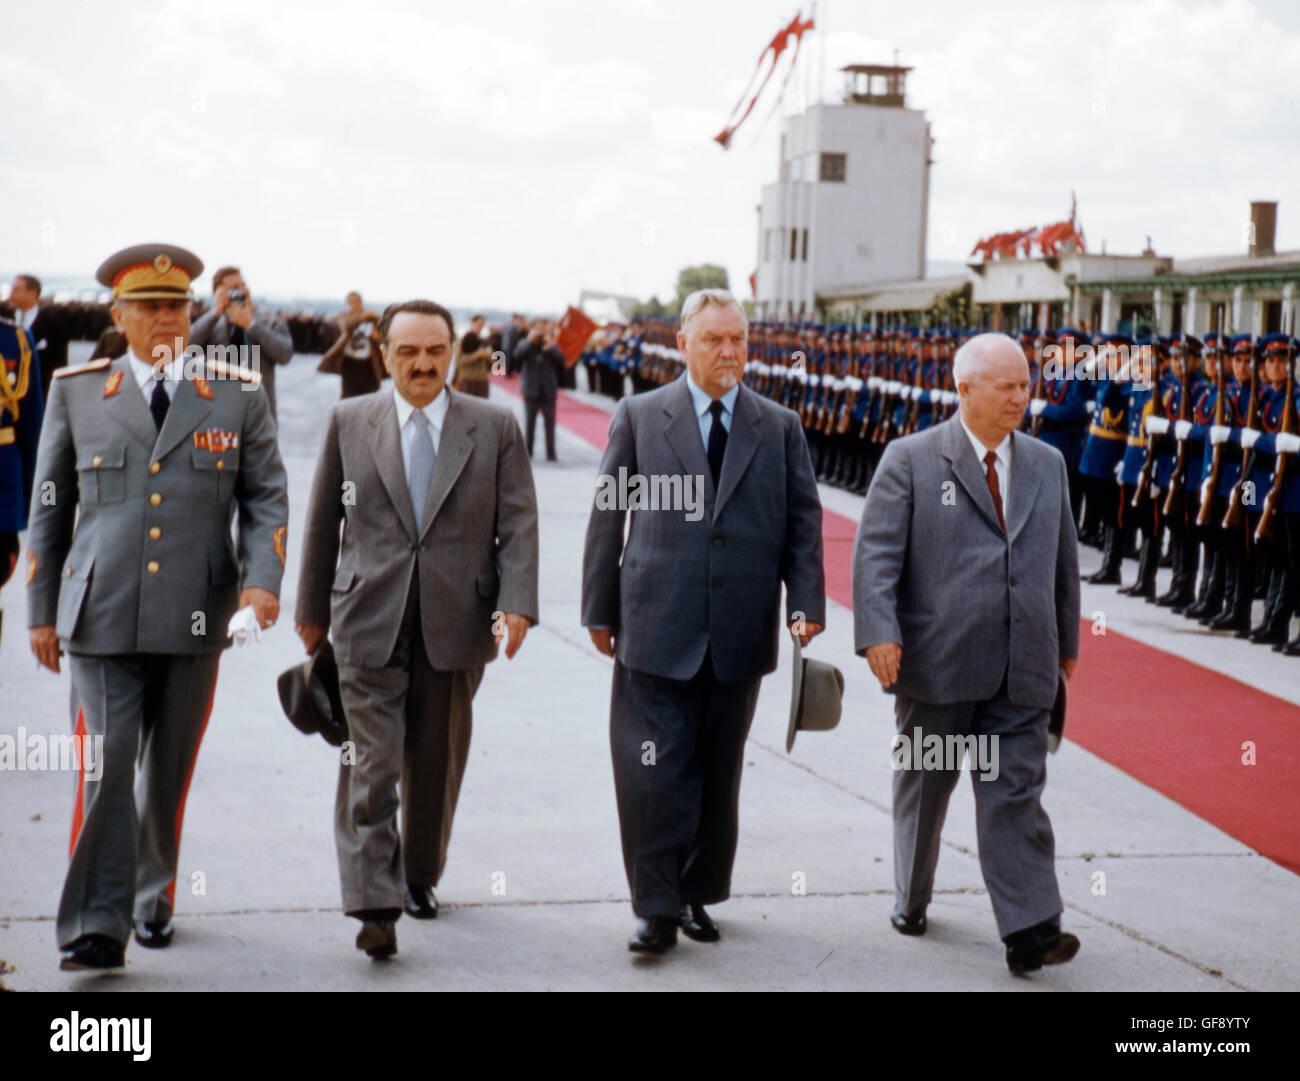 Josip Tito, Anastas Mikoyan, Nikolai Bulganin, and Nikita Khrushchev - Stock Image